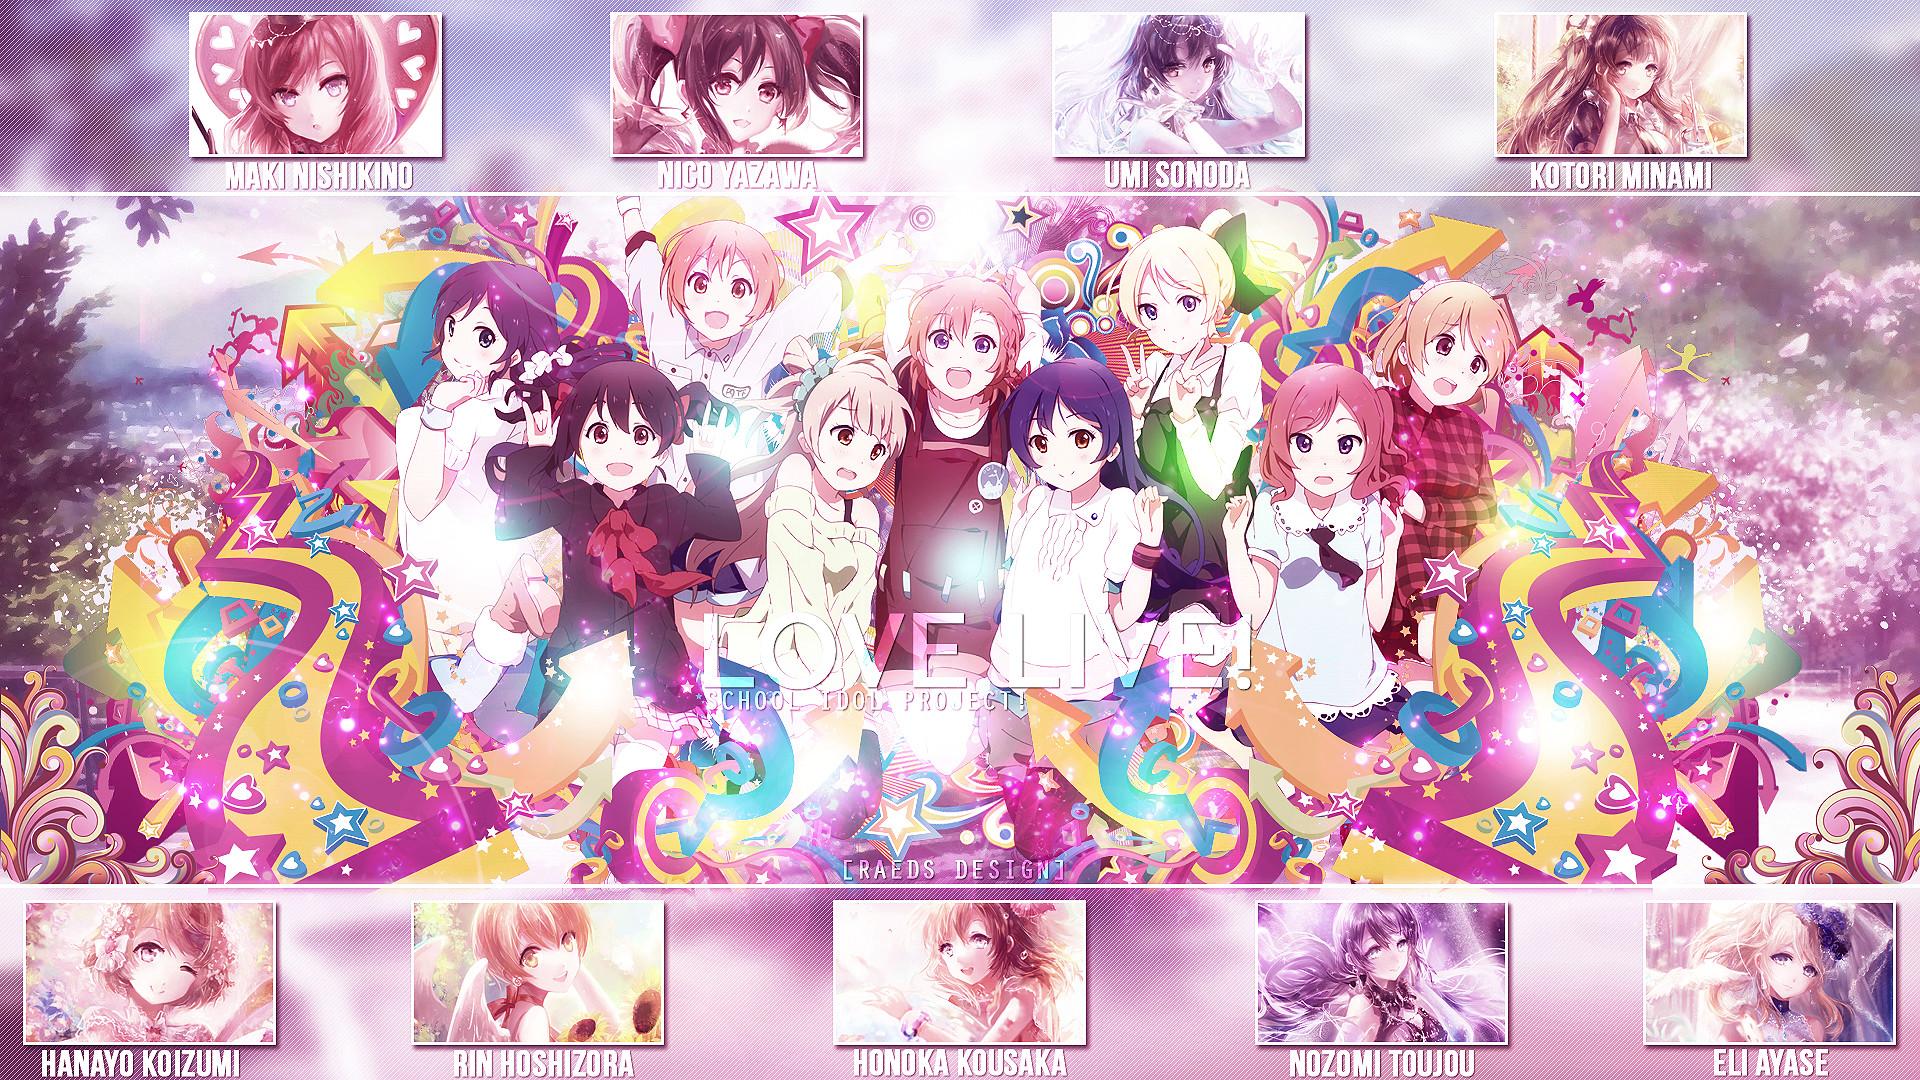 Res: 1920x1080, School Idol Project by kikiaryos Wallpaper - Love Live! School Idol Project  by kikiaryos